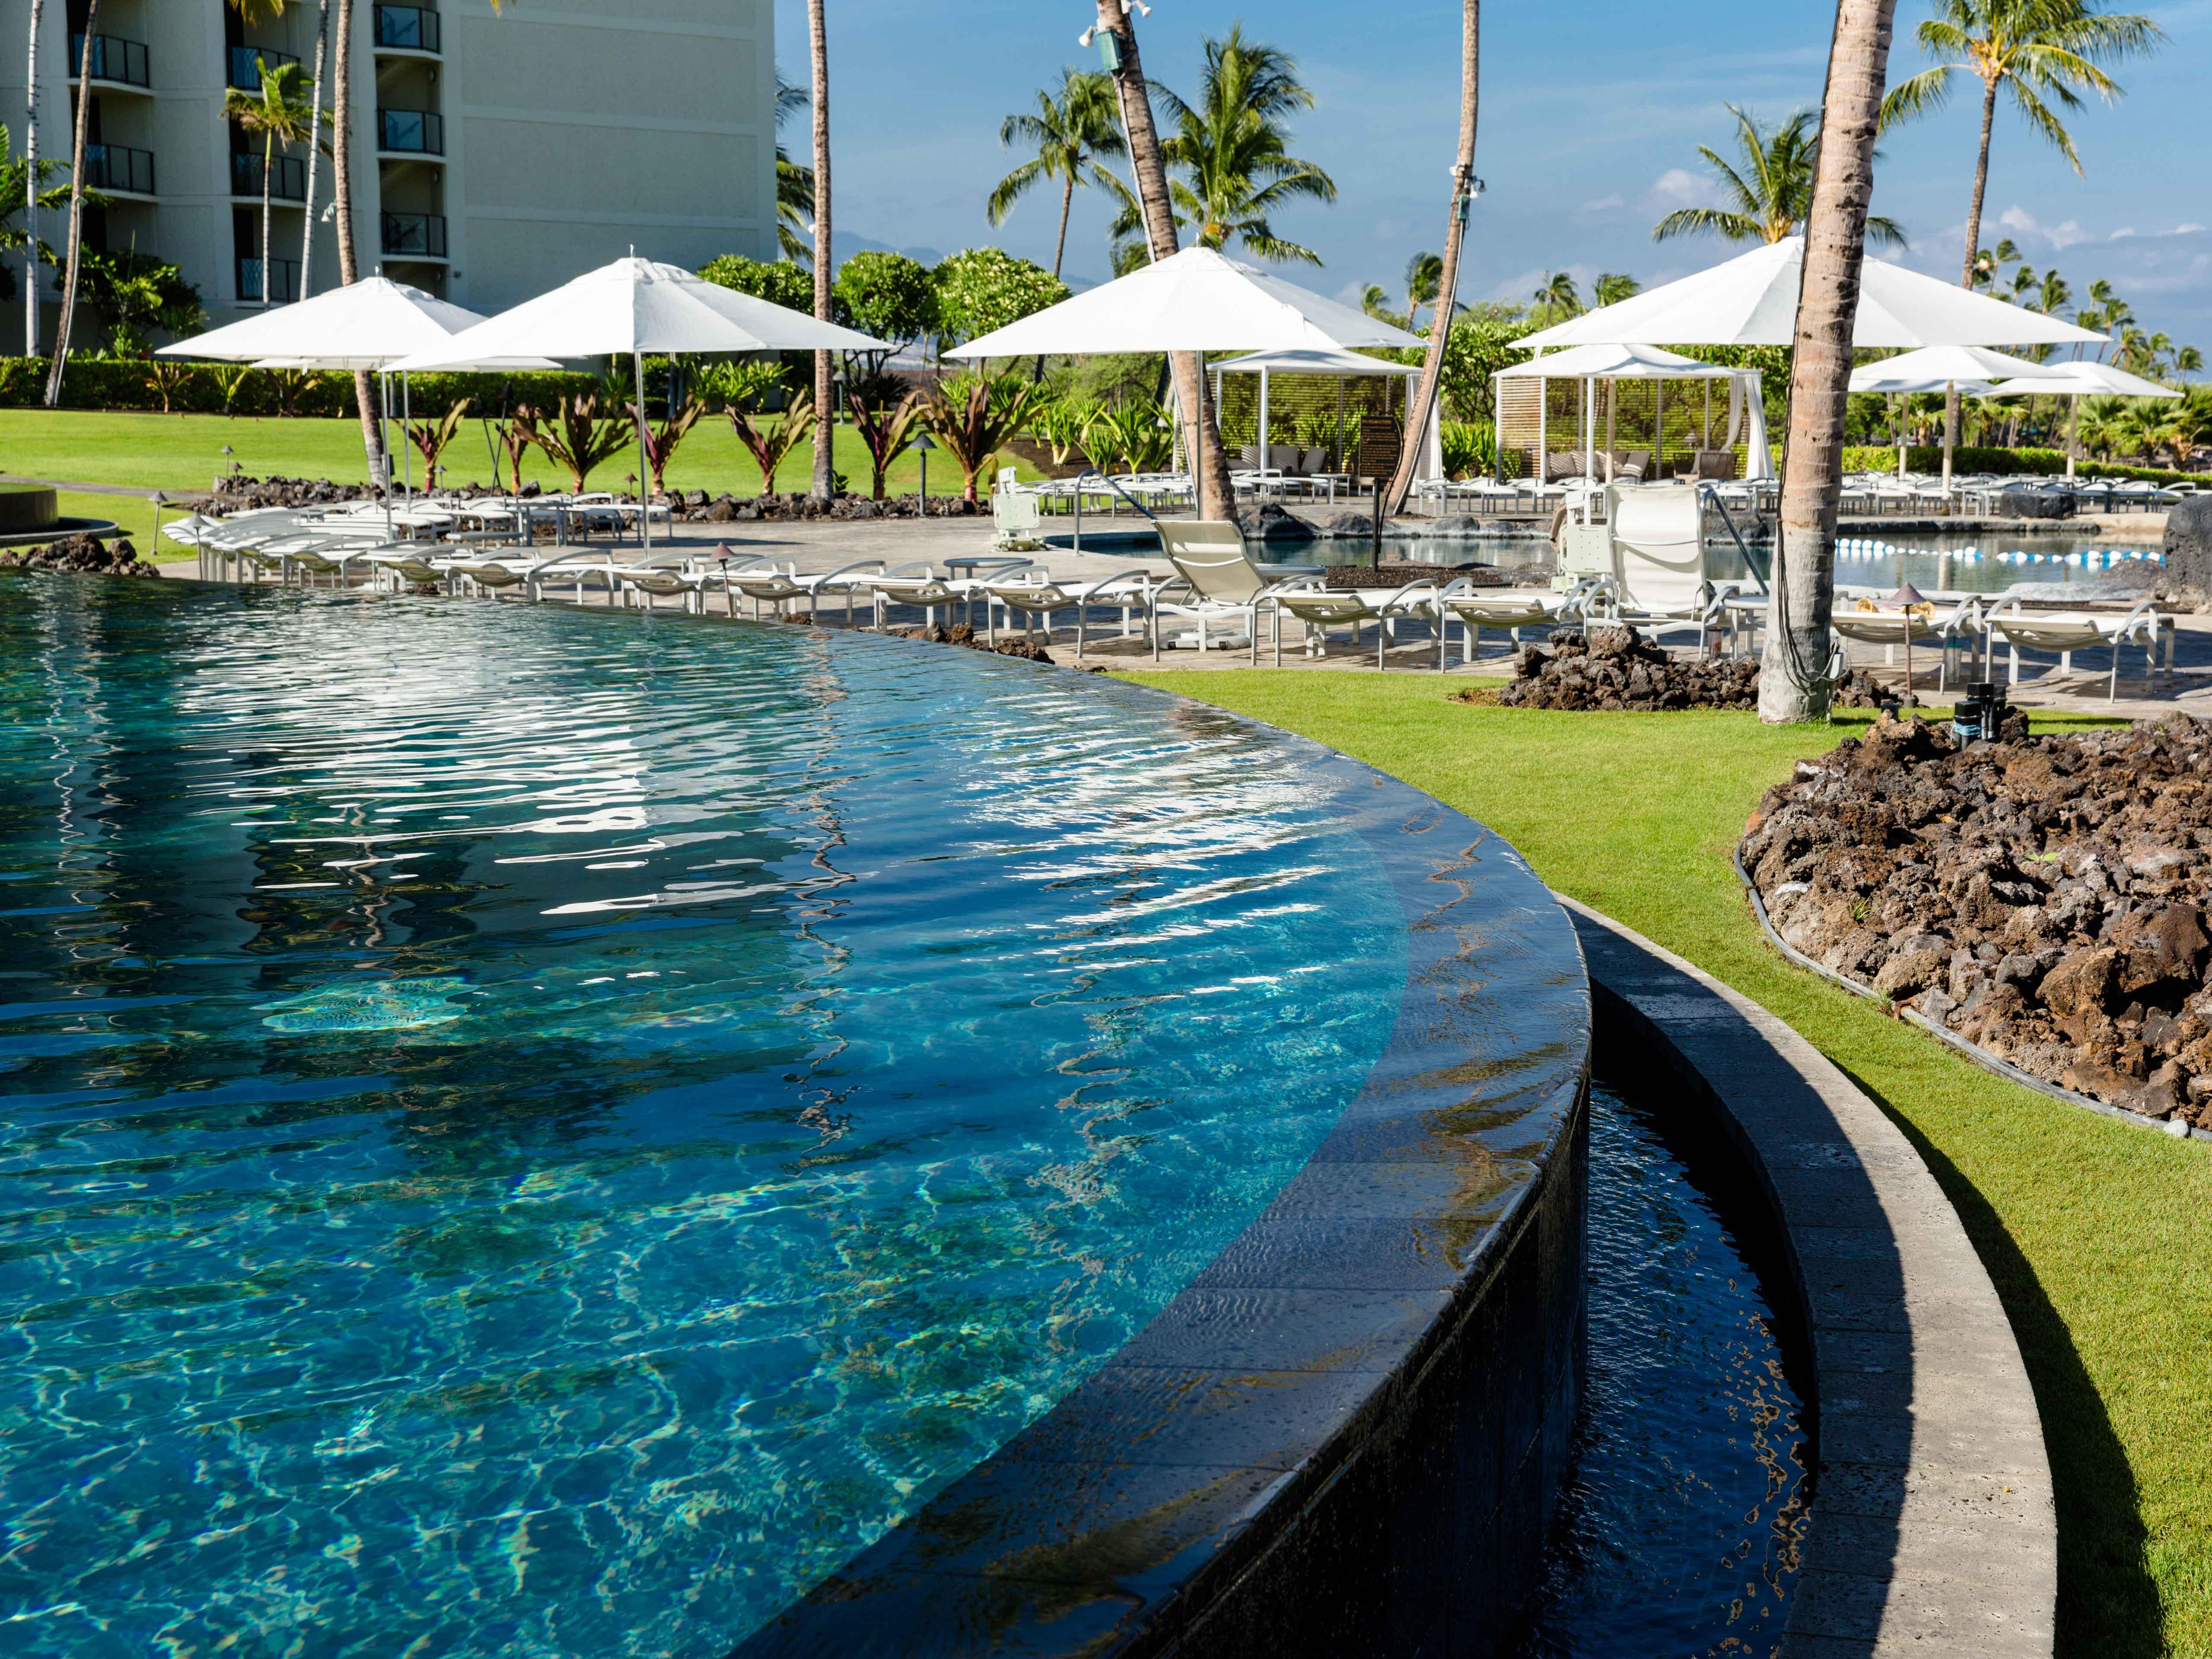 Marriott's Waikoloa Ocean Club Infinity Pool. Marriott's Waikoloa Ocean Club is located in Waikoloa Beach, Big Island, Hawai'i United States.